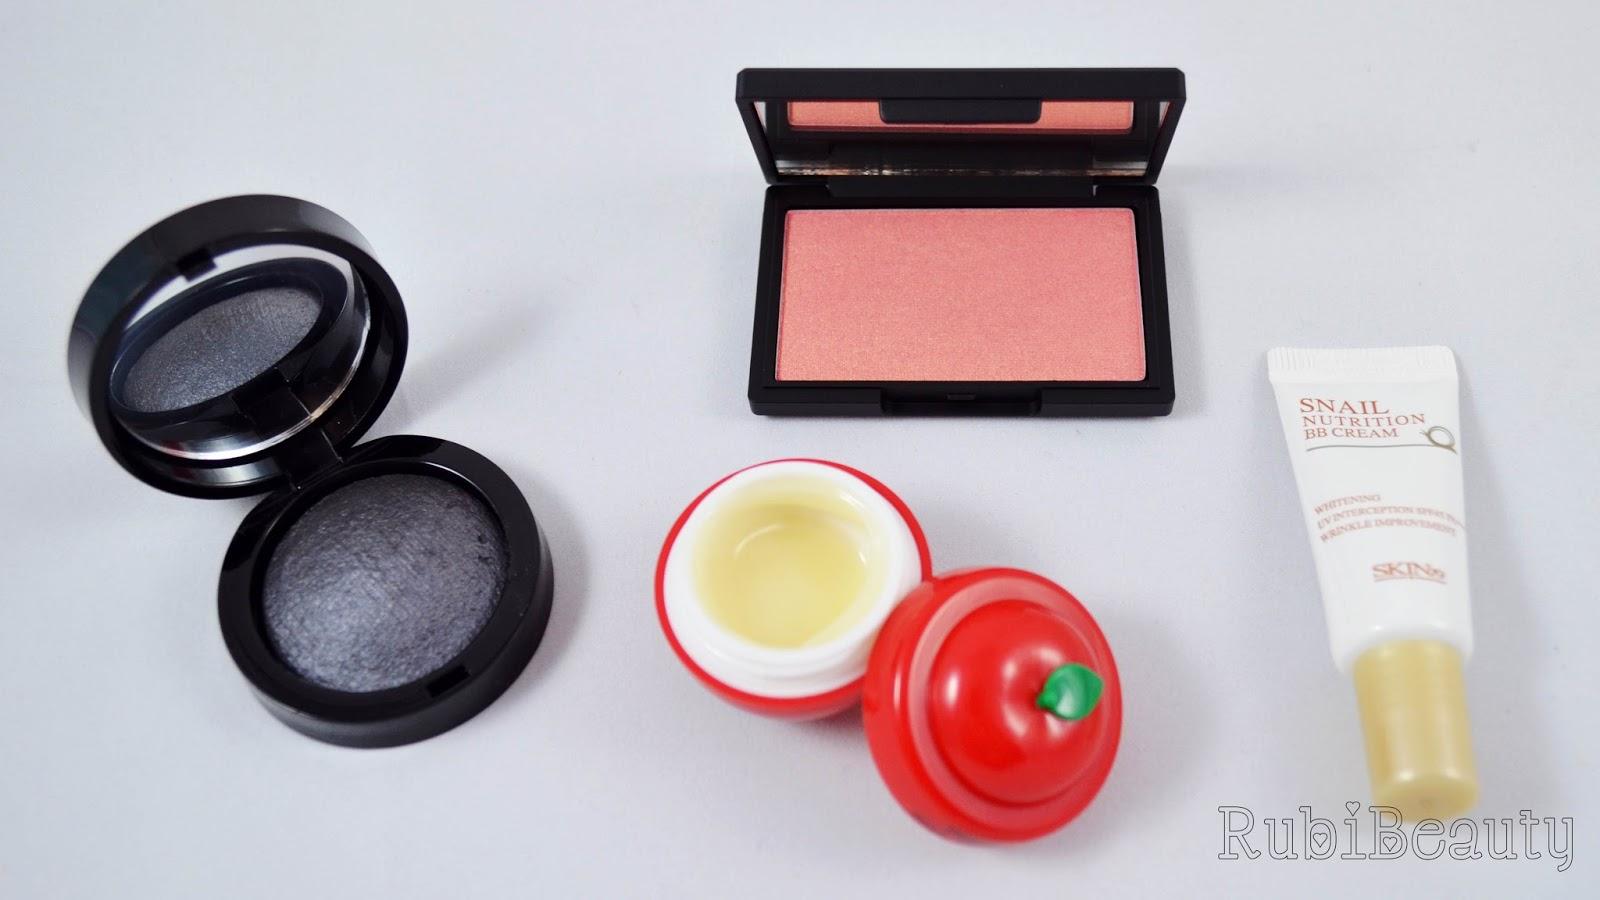 rubibeauty compras black friday maquillalia primor rose gold sleek baviphat skin79